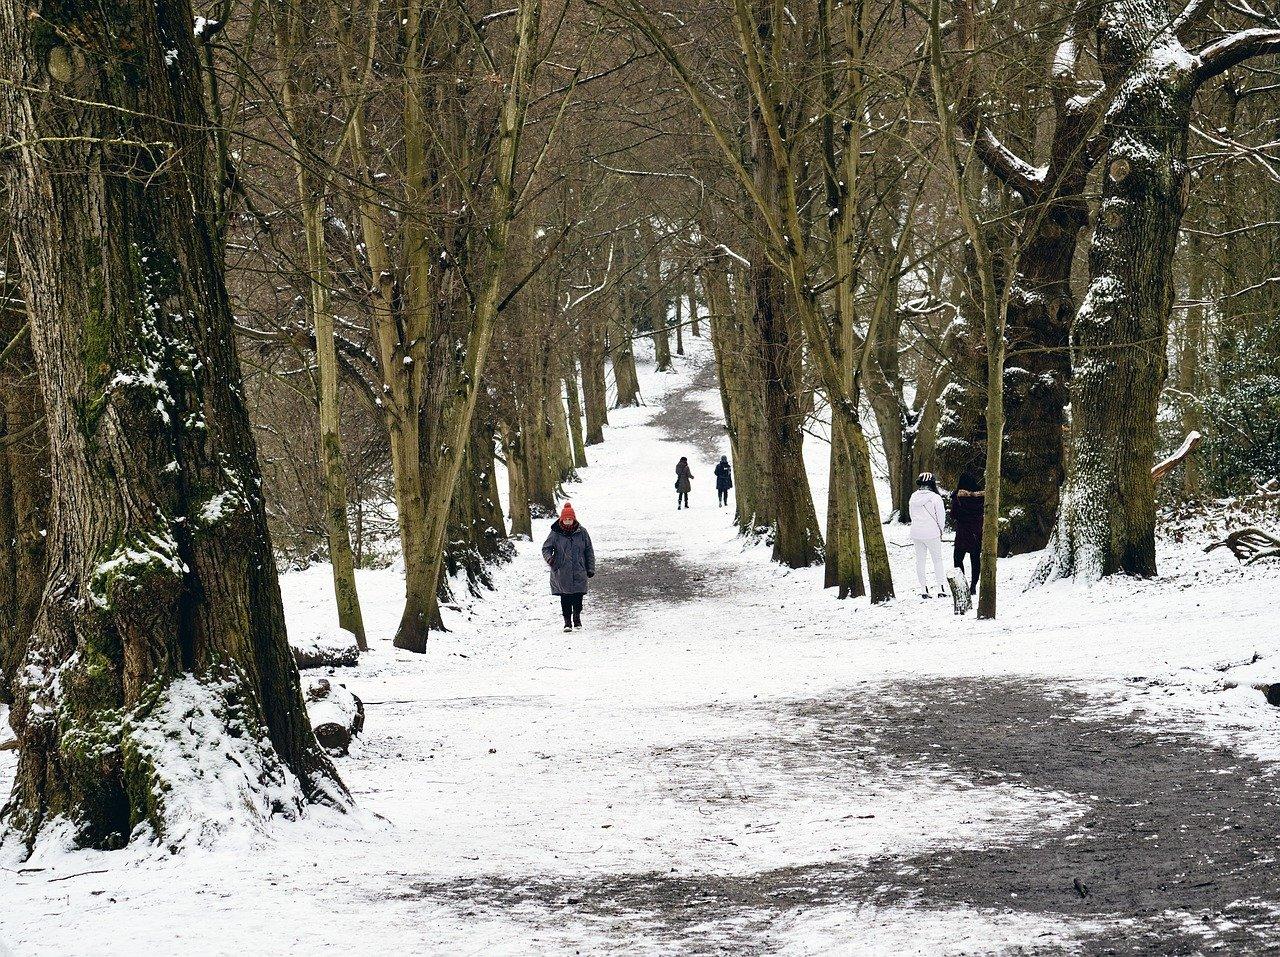 Selsdon park